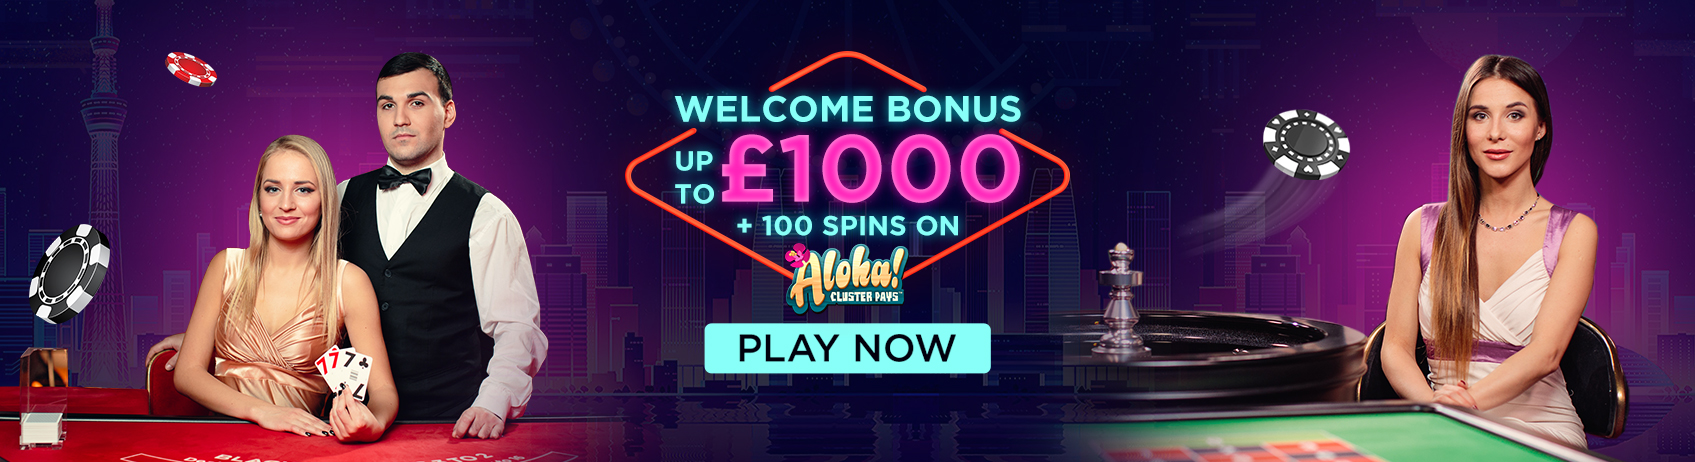 Live Casino Offer